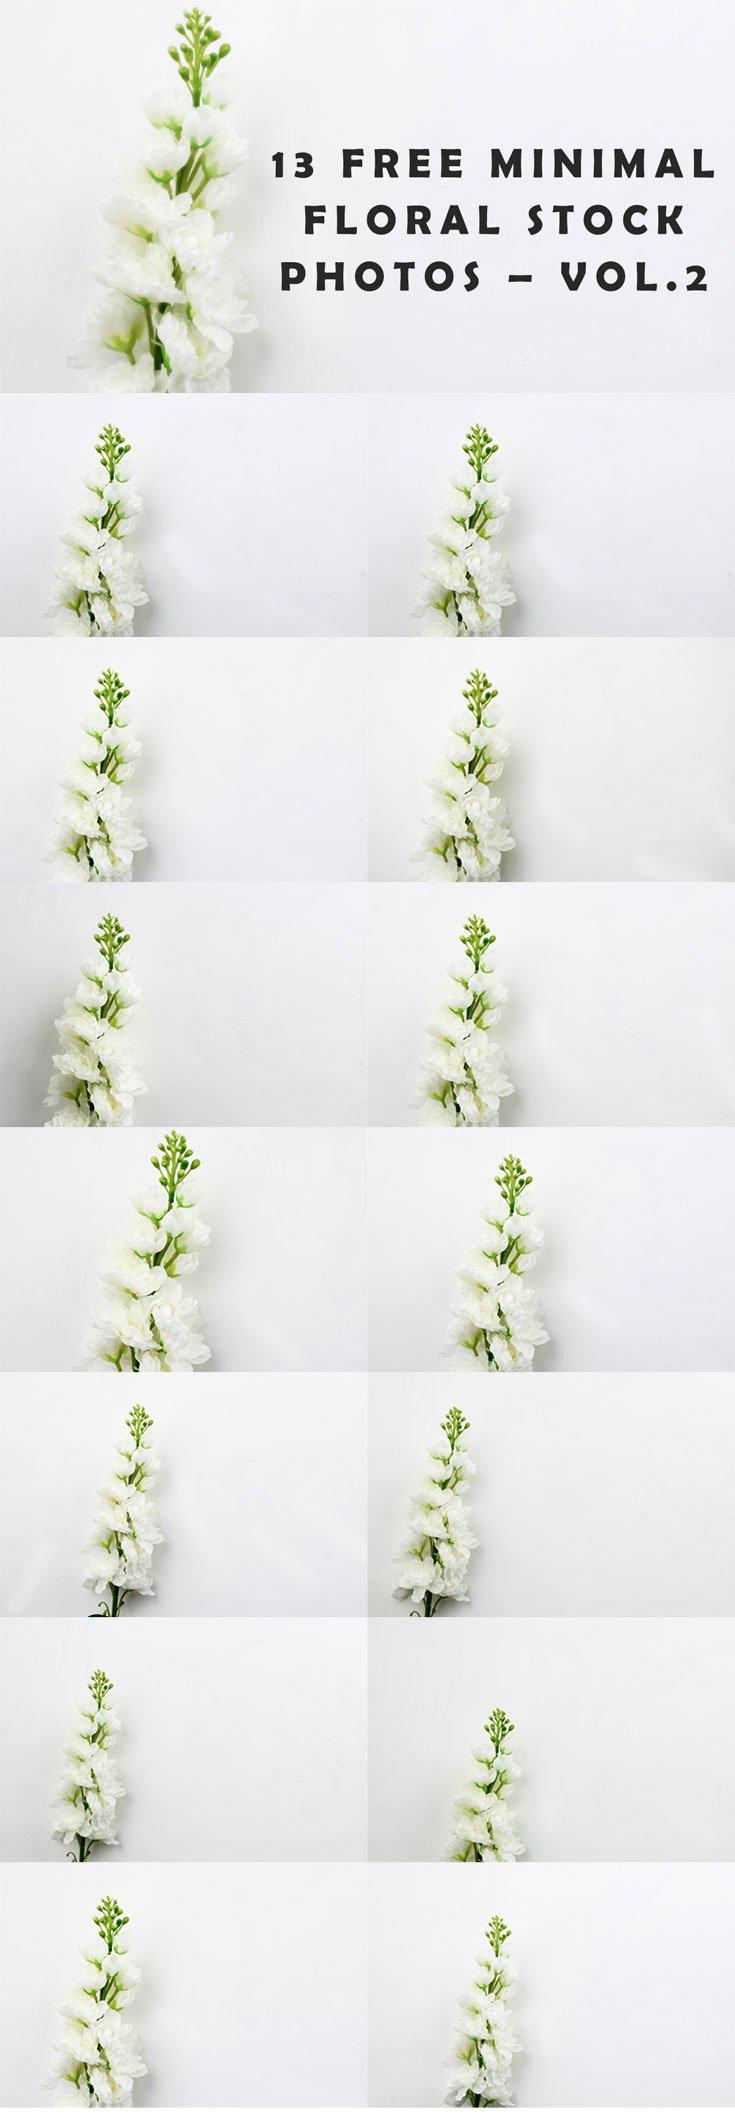 13 Free Minimal Floral Stock Photos – Vol.2